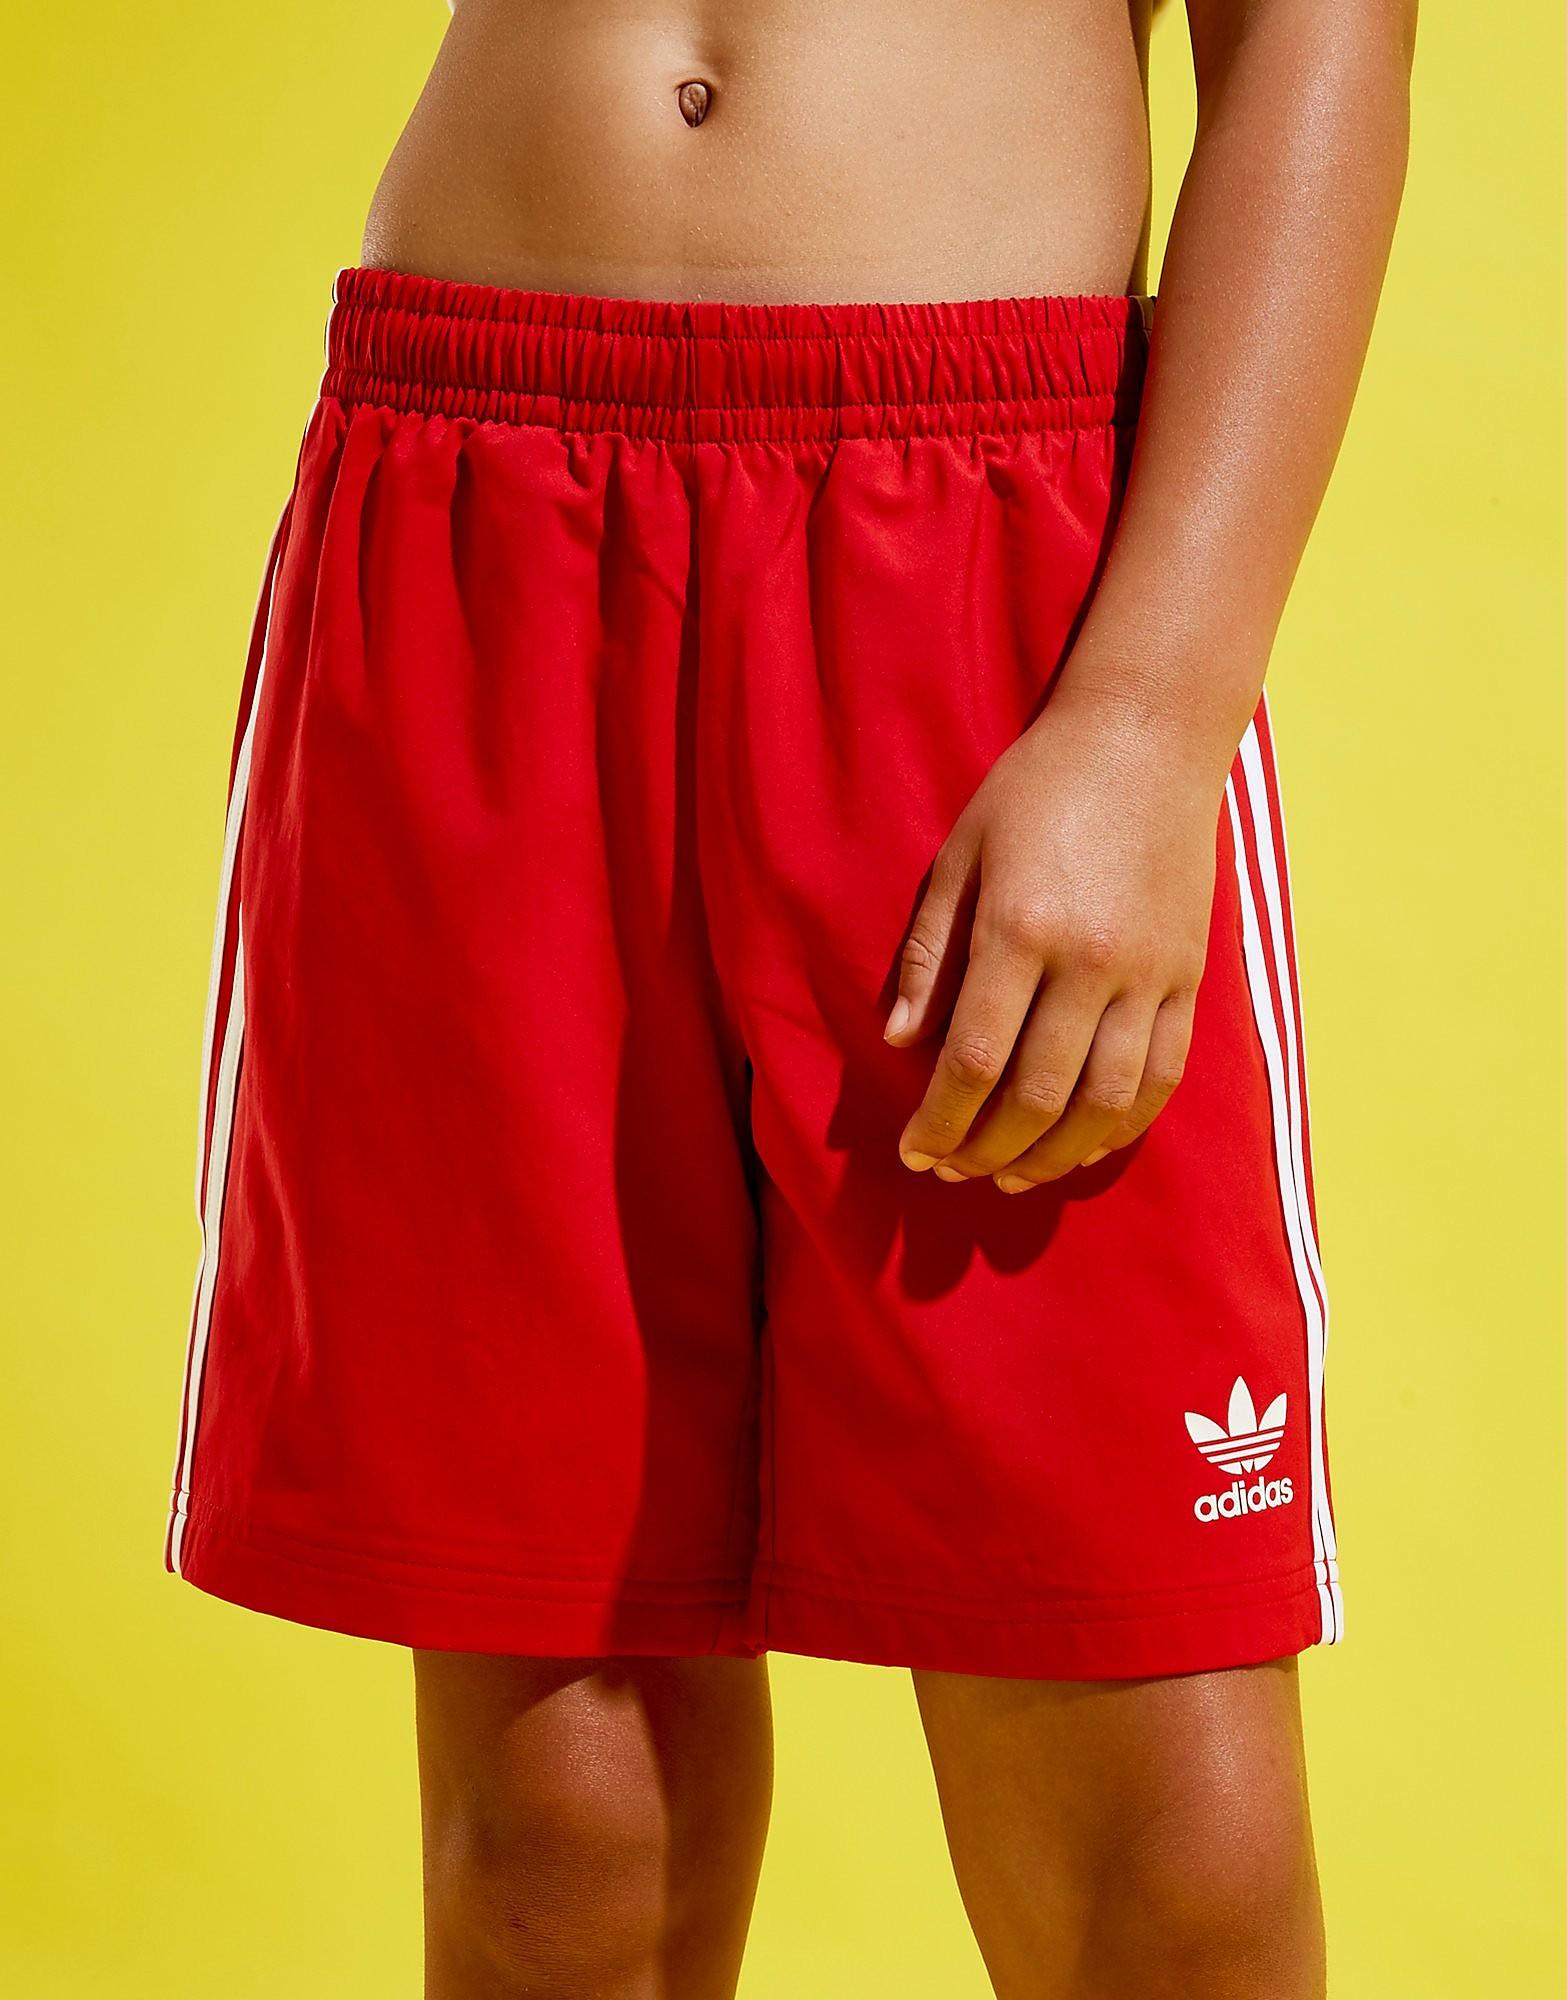 adidas Originals Trefoil Swim Shorts Junior - Rood - Kind